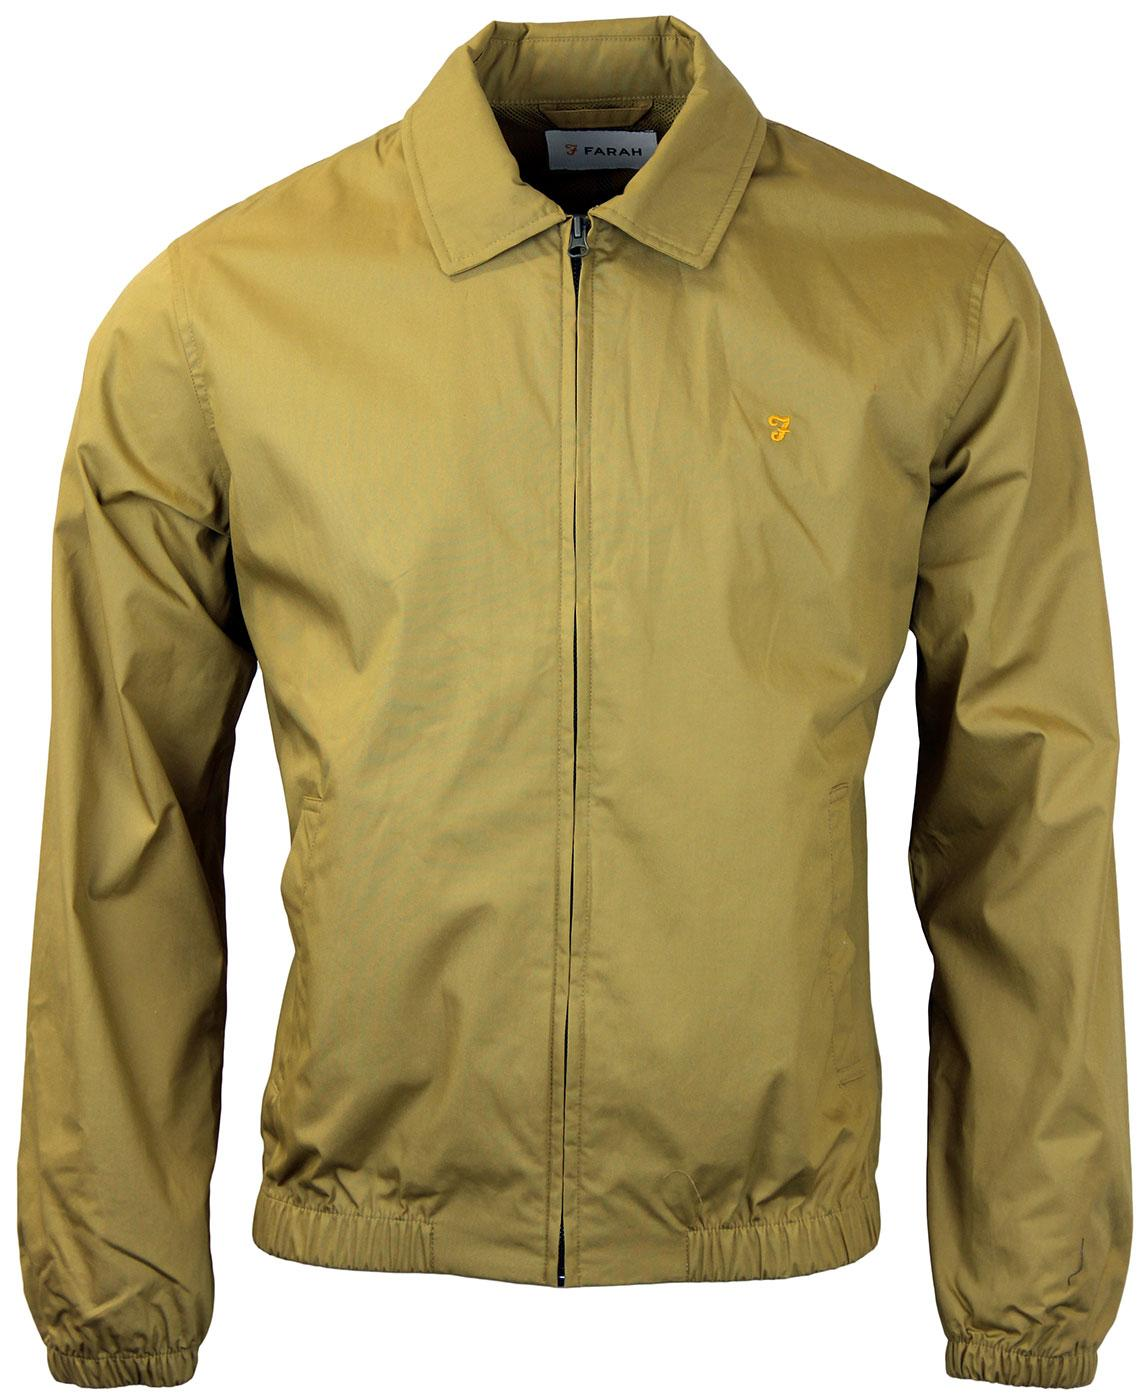 Rawken FARAH VINTAGE Mod Harrington Jacket AB